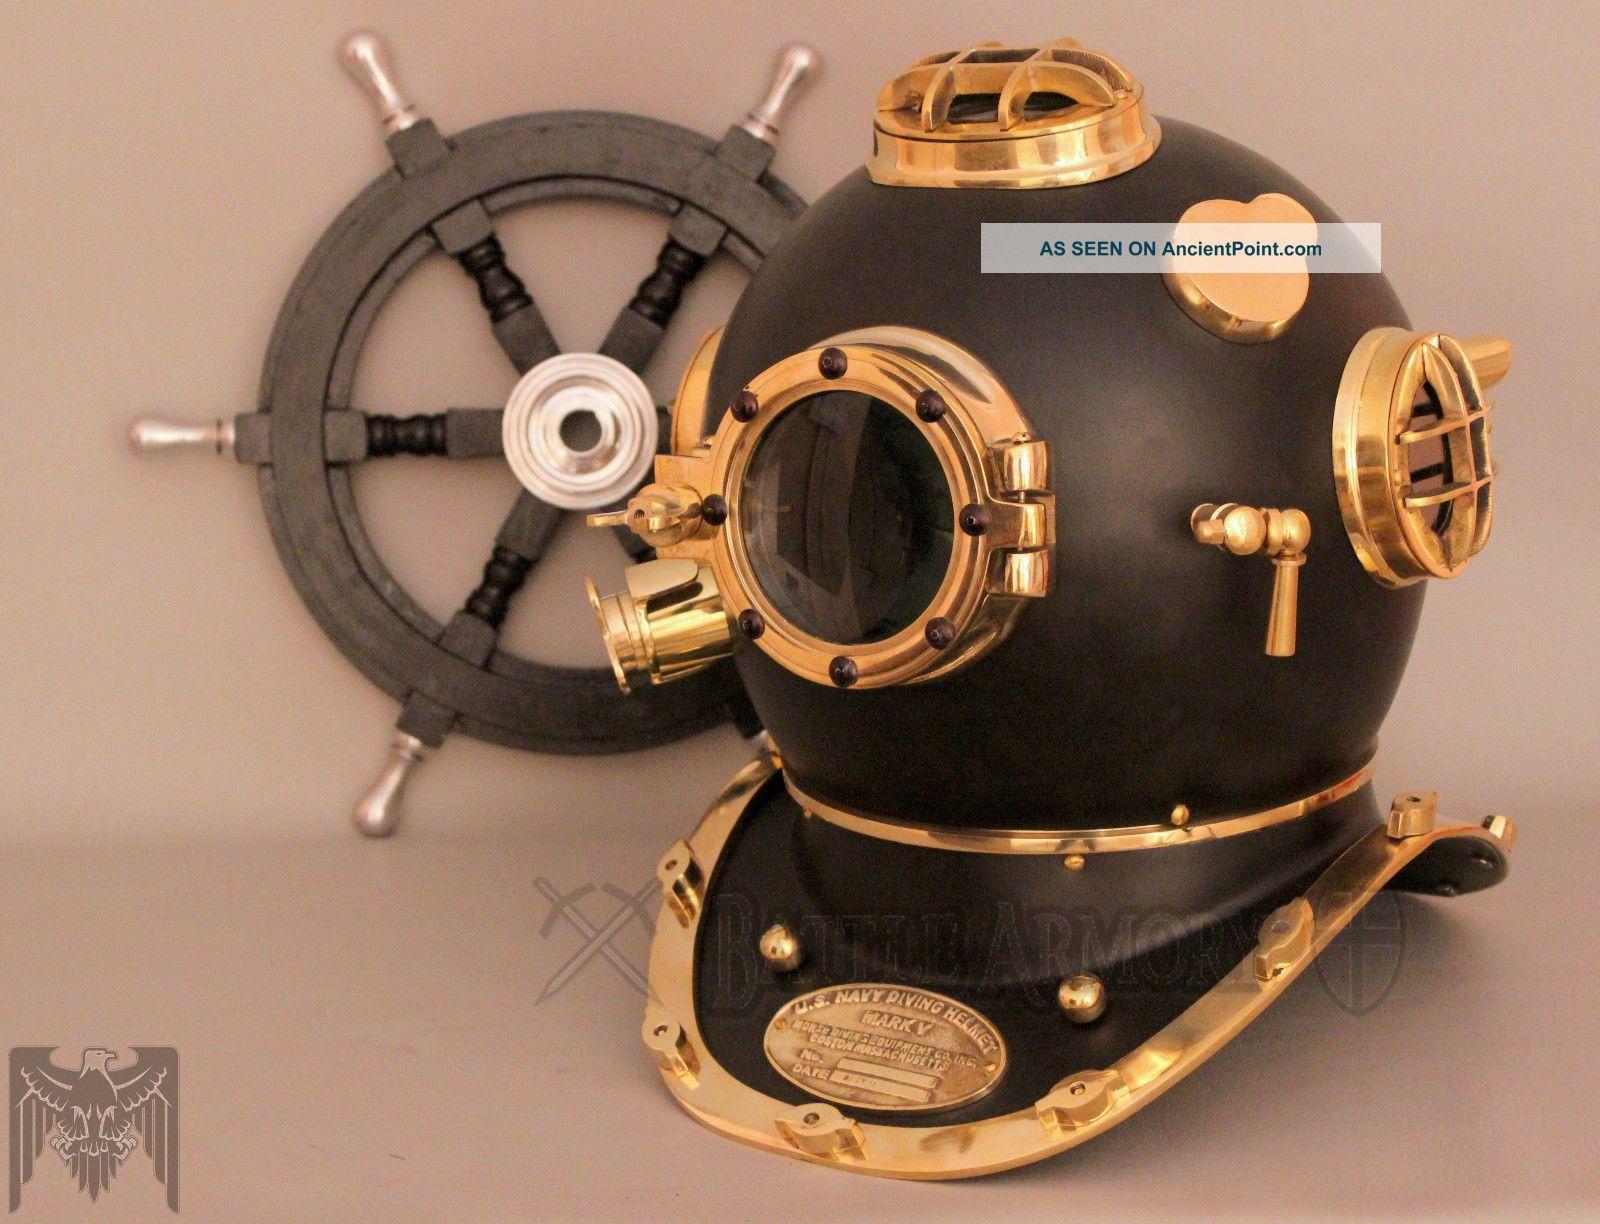 Antique Vintage U.  S Navy Mark V Model Diving Divers Helmet Full Brass 18 Inch Diving Helmets photo